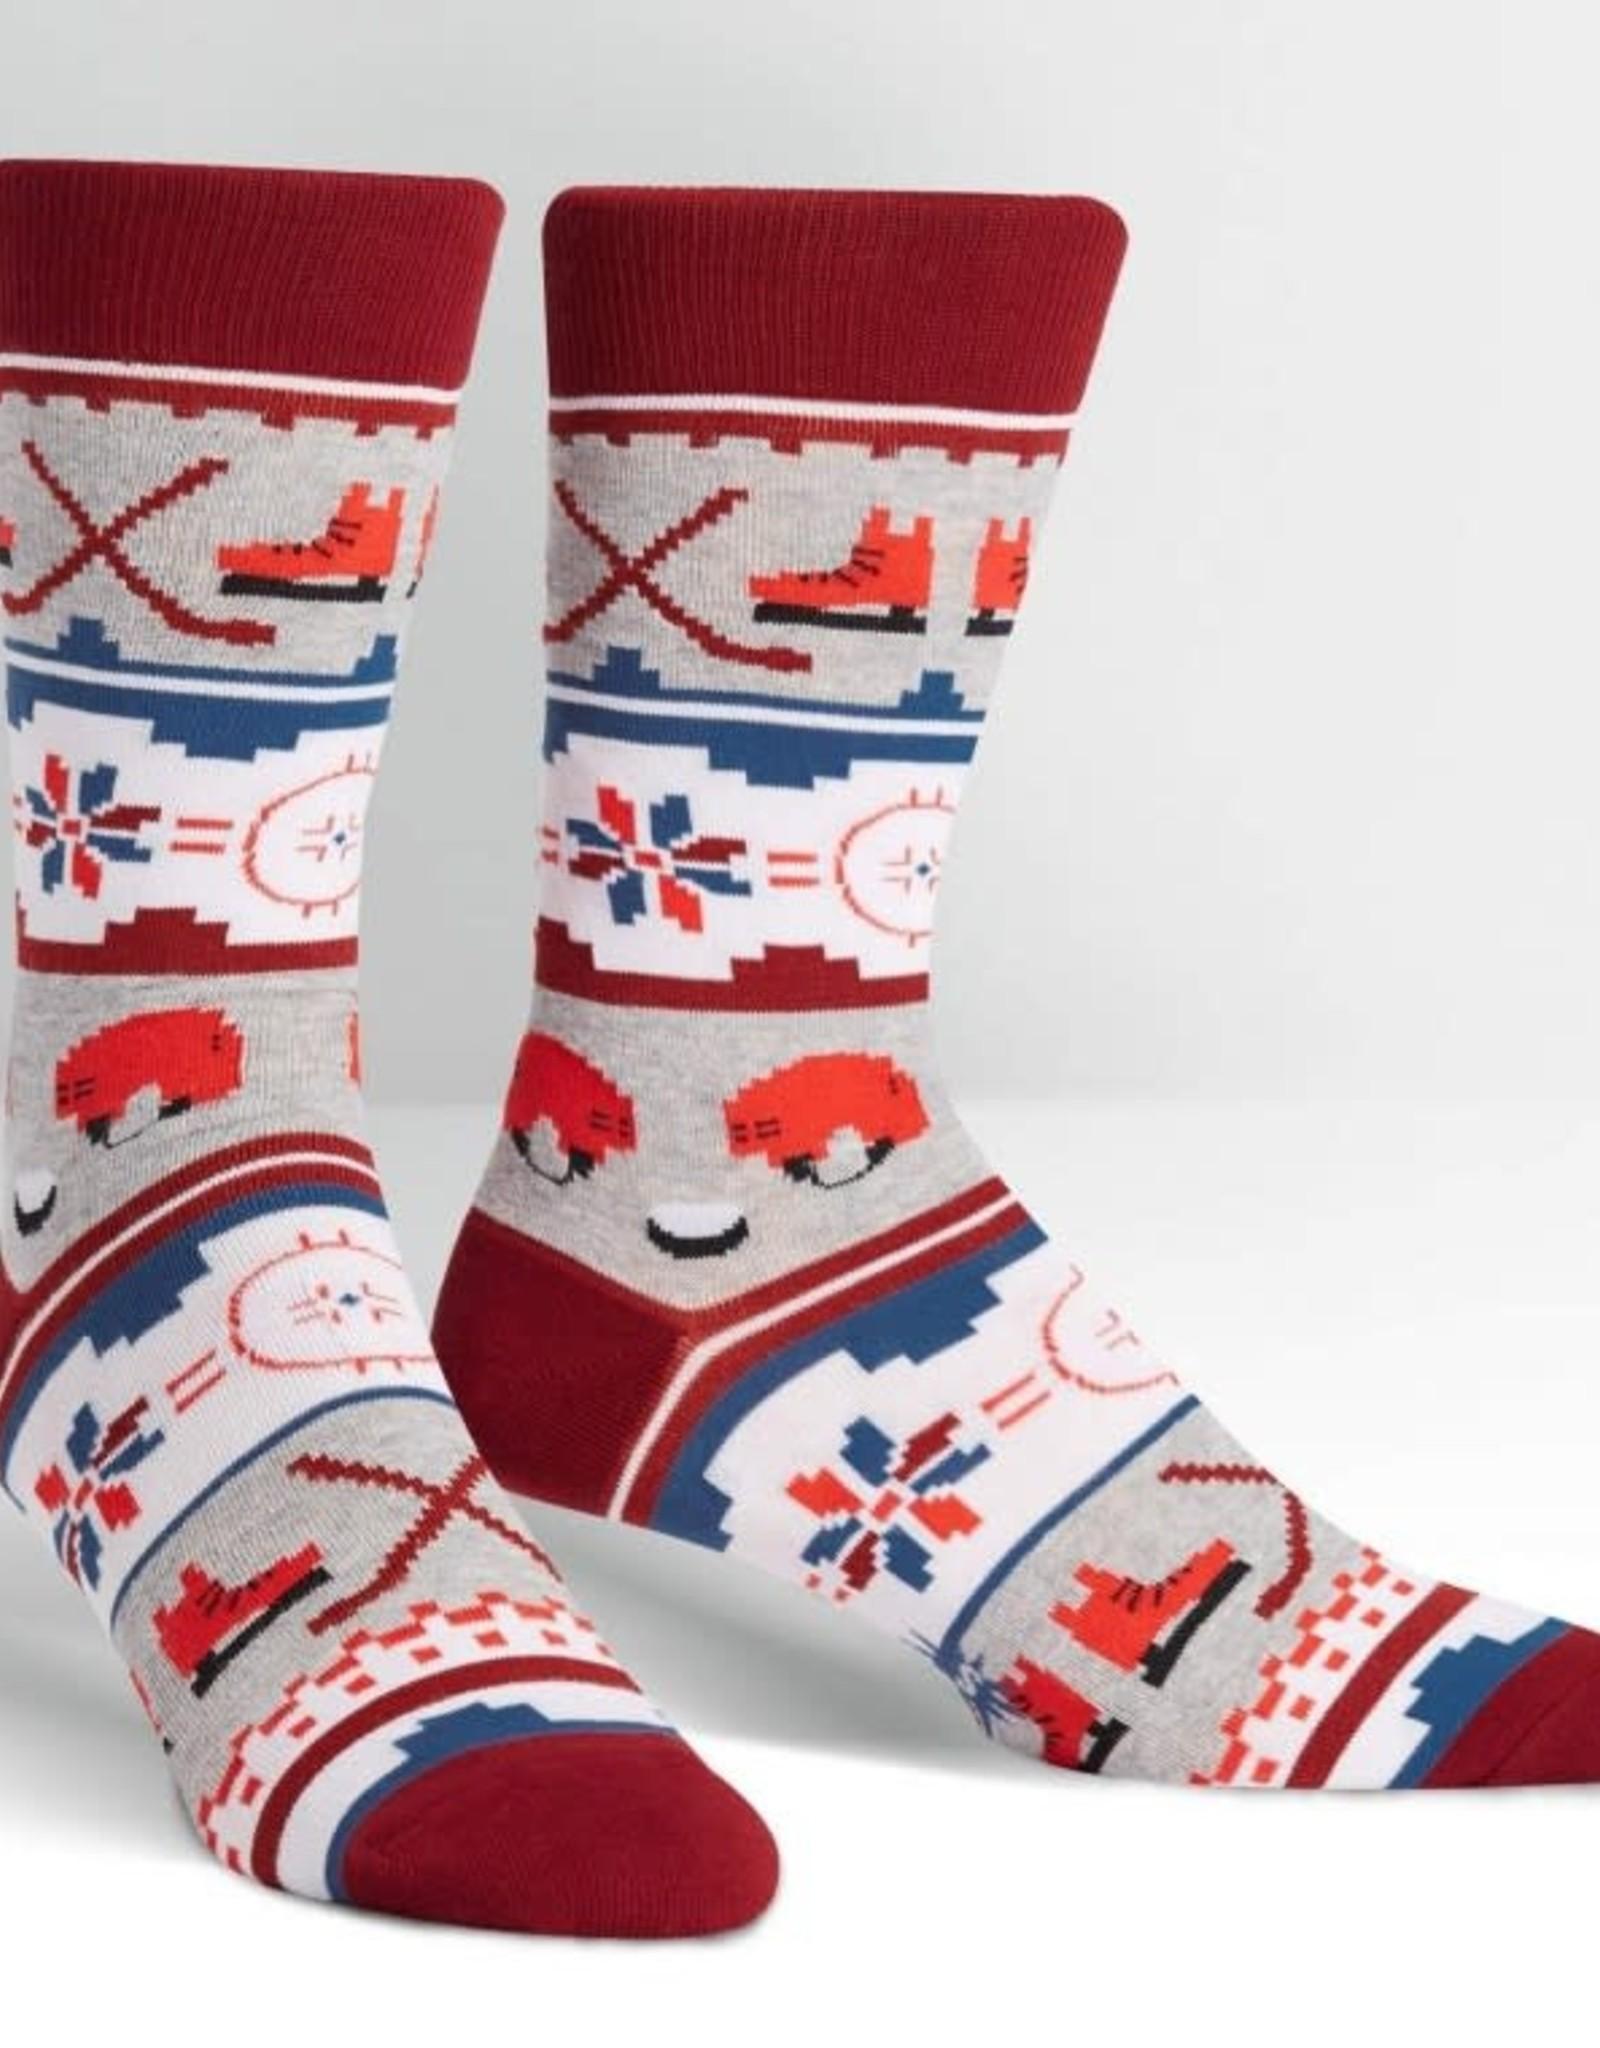 Sock It To Me MEN'S CREW: UGLY HOCKEY SWEATER